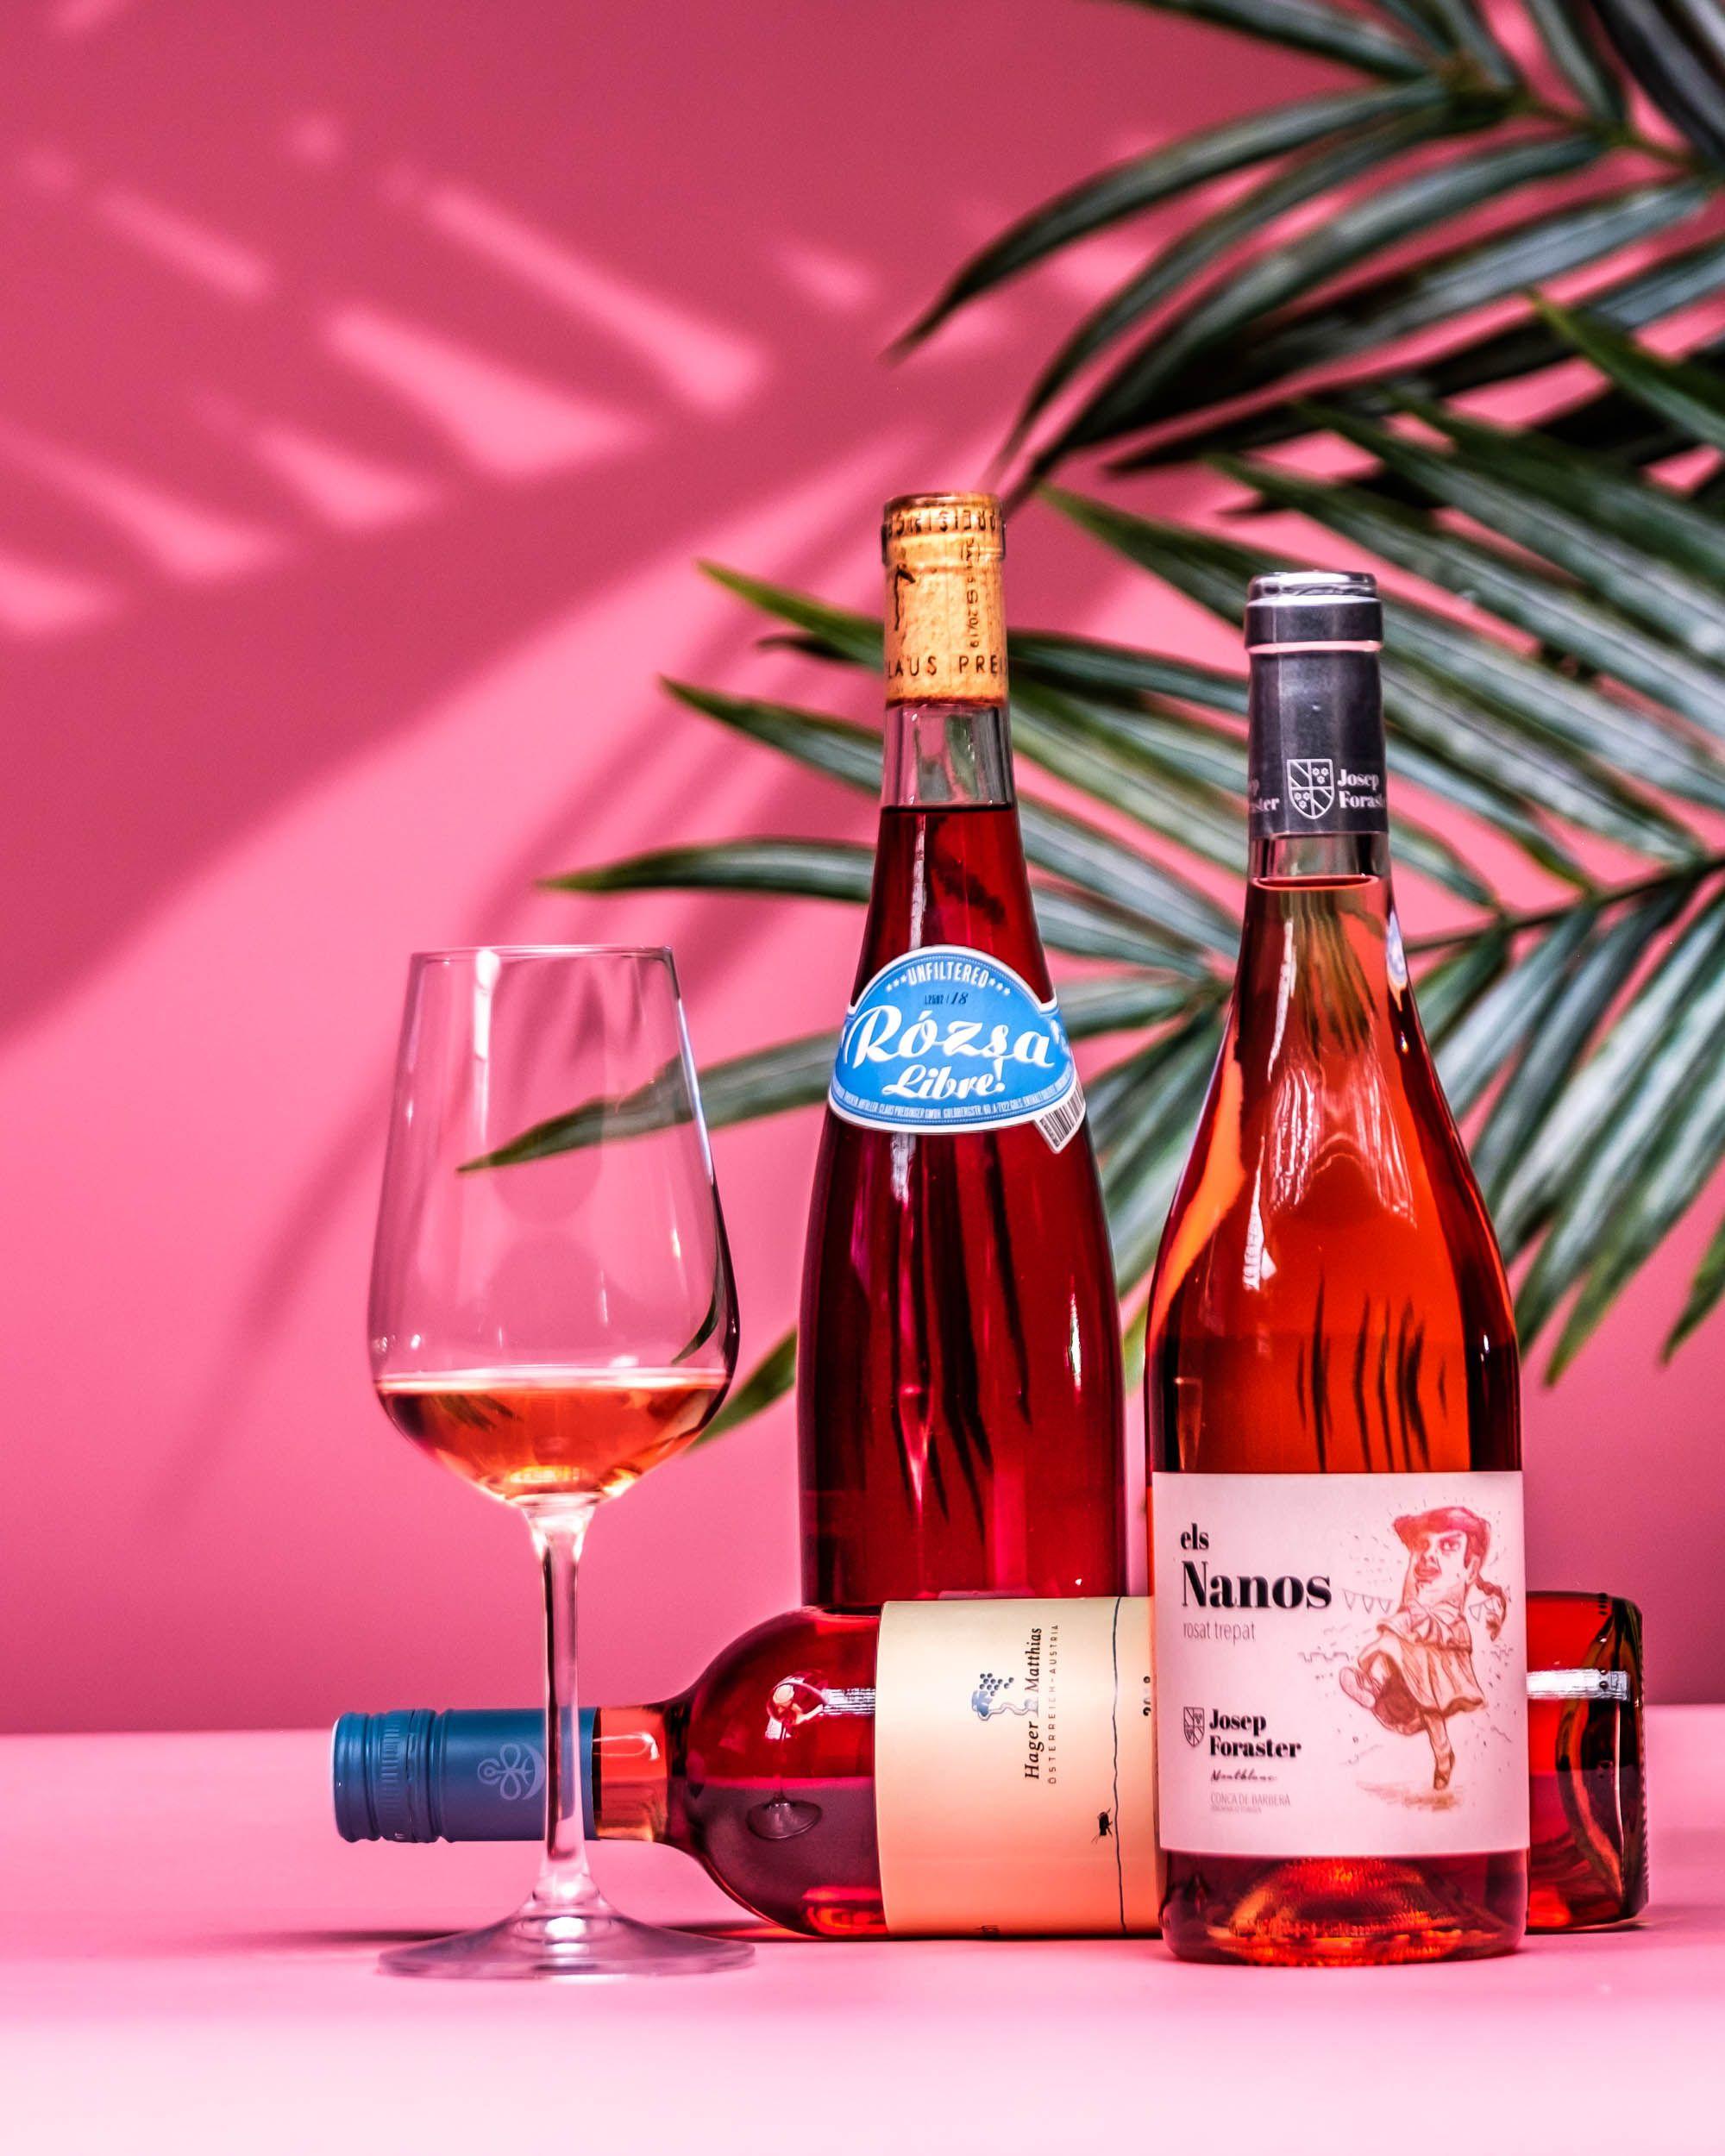 Spring Rose Membership In 2020 Spring Roses Paleo Wine Organic Wine